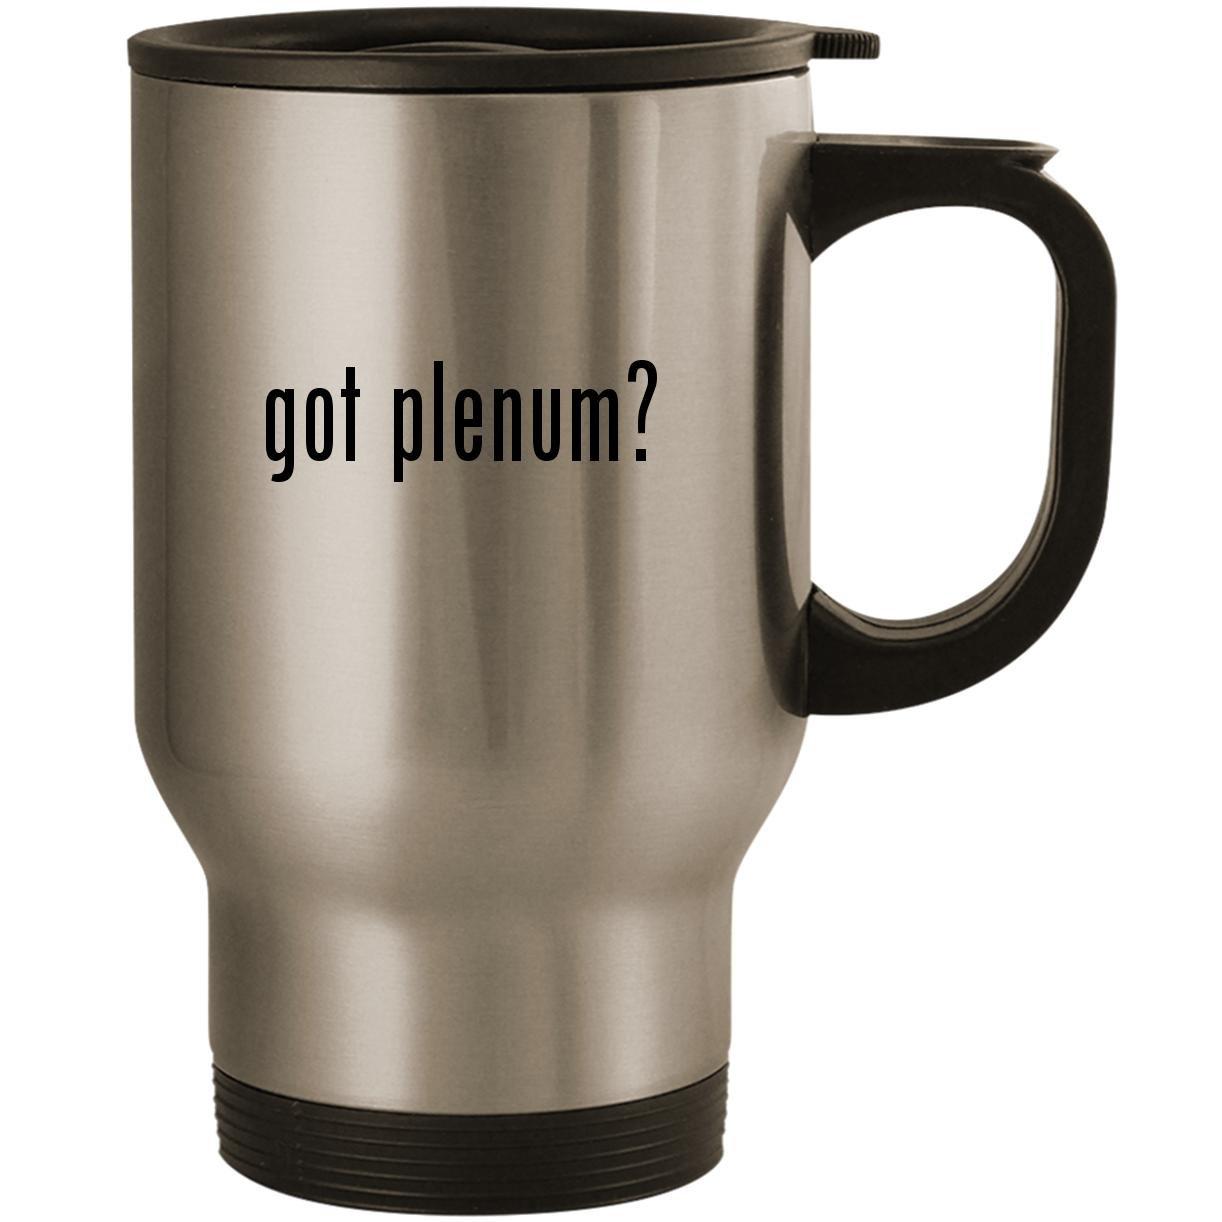 Amazon com: got plenum? - Stainless Steel 14oz Road Ready